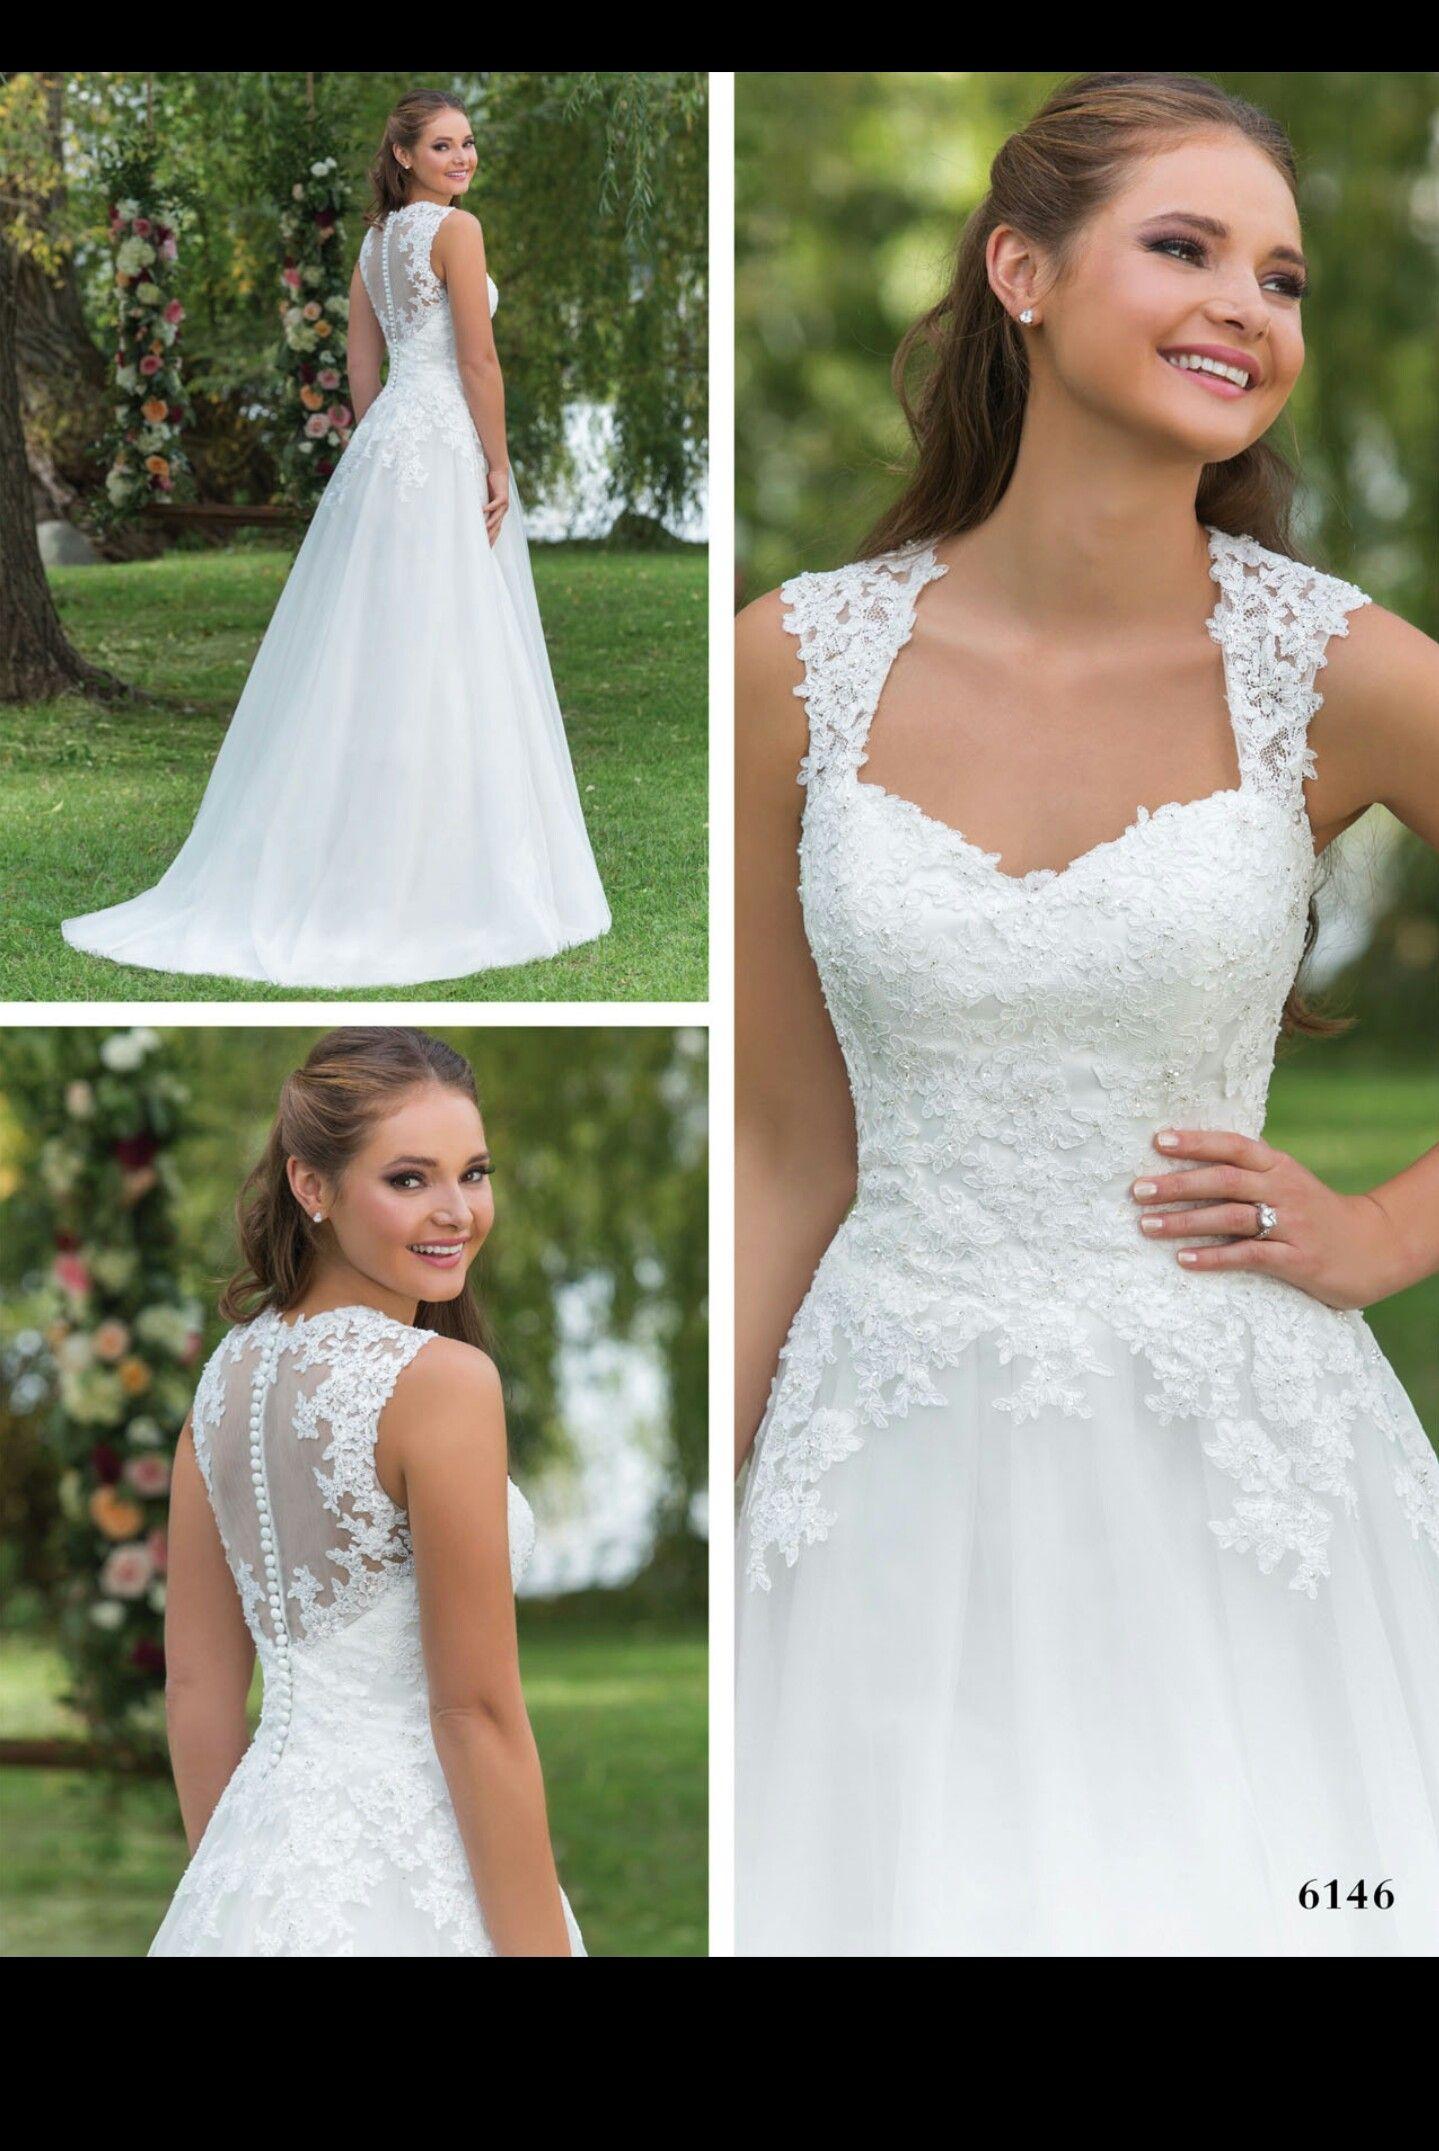 Photo of A wonderful wedding dress